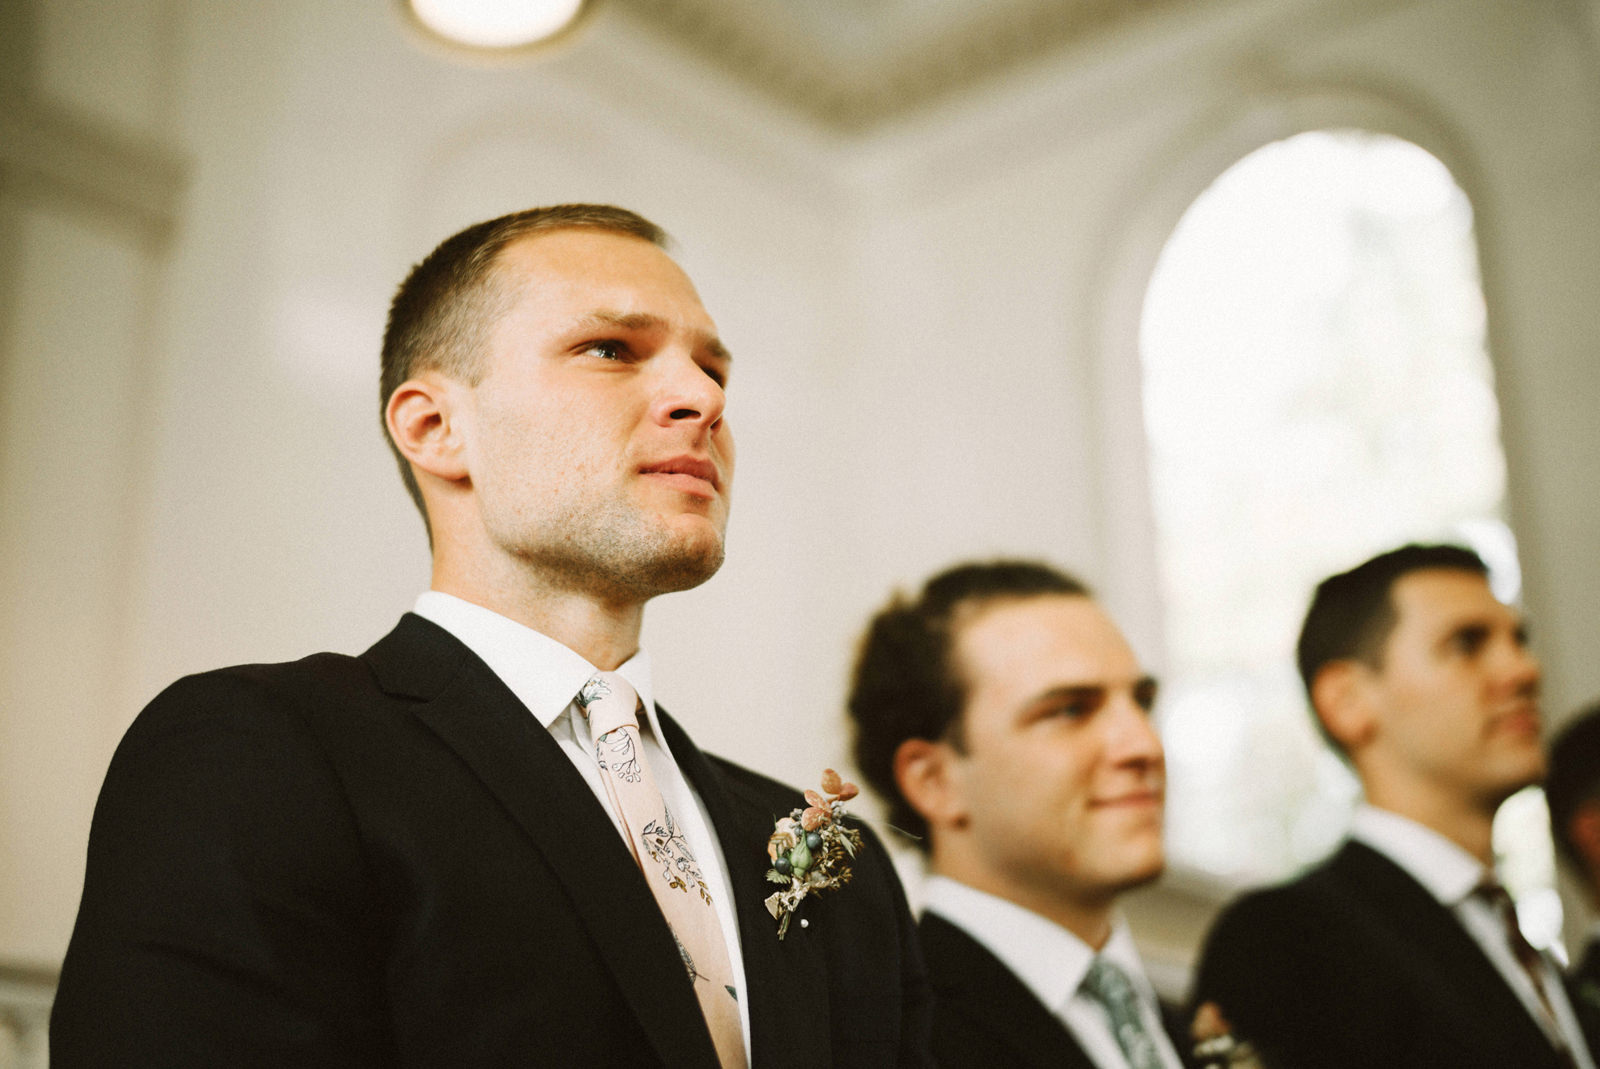 bridgeport-wedding-045 BRIDGEPORT, CONNECTICUT BACKYARD WEDDING